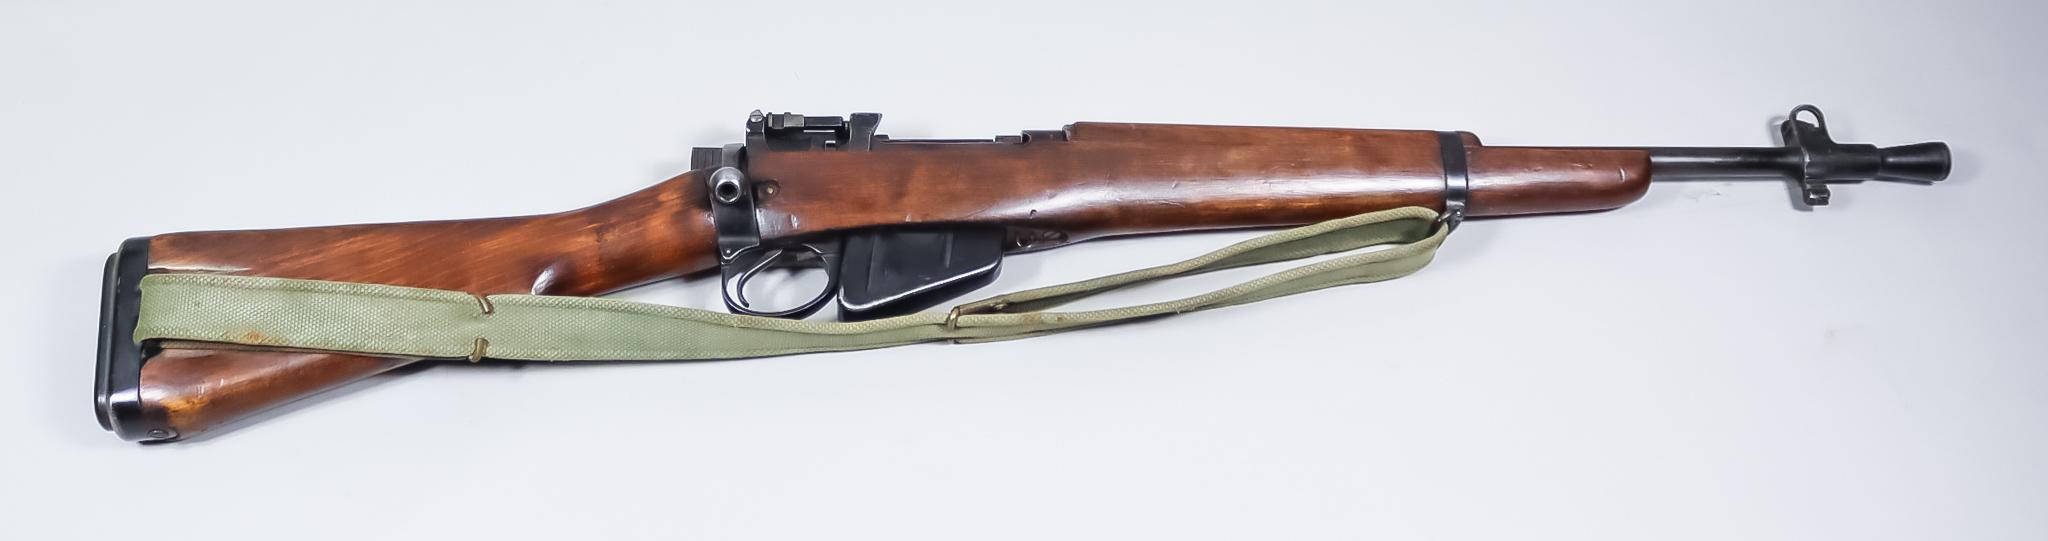 "A .303 Calibre Rifle ""Jungle Carbine"" MKI by Lee Enfield, No 5,1946 , Serial No. 69700, with rare"